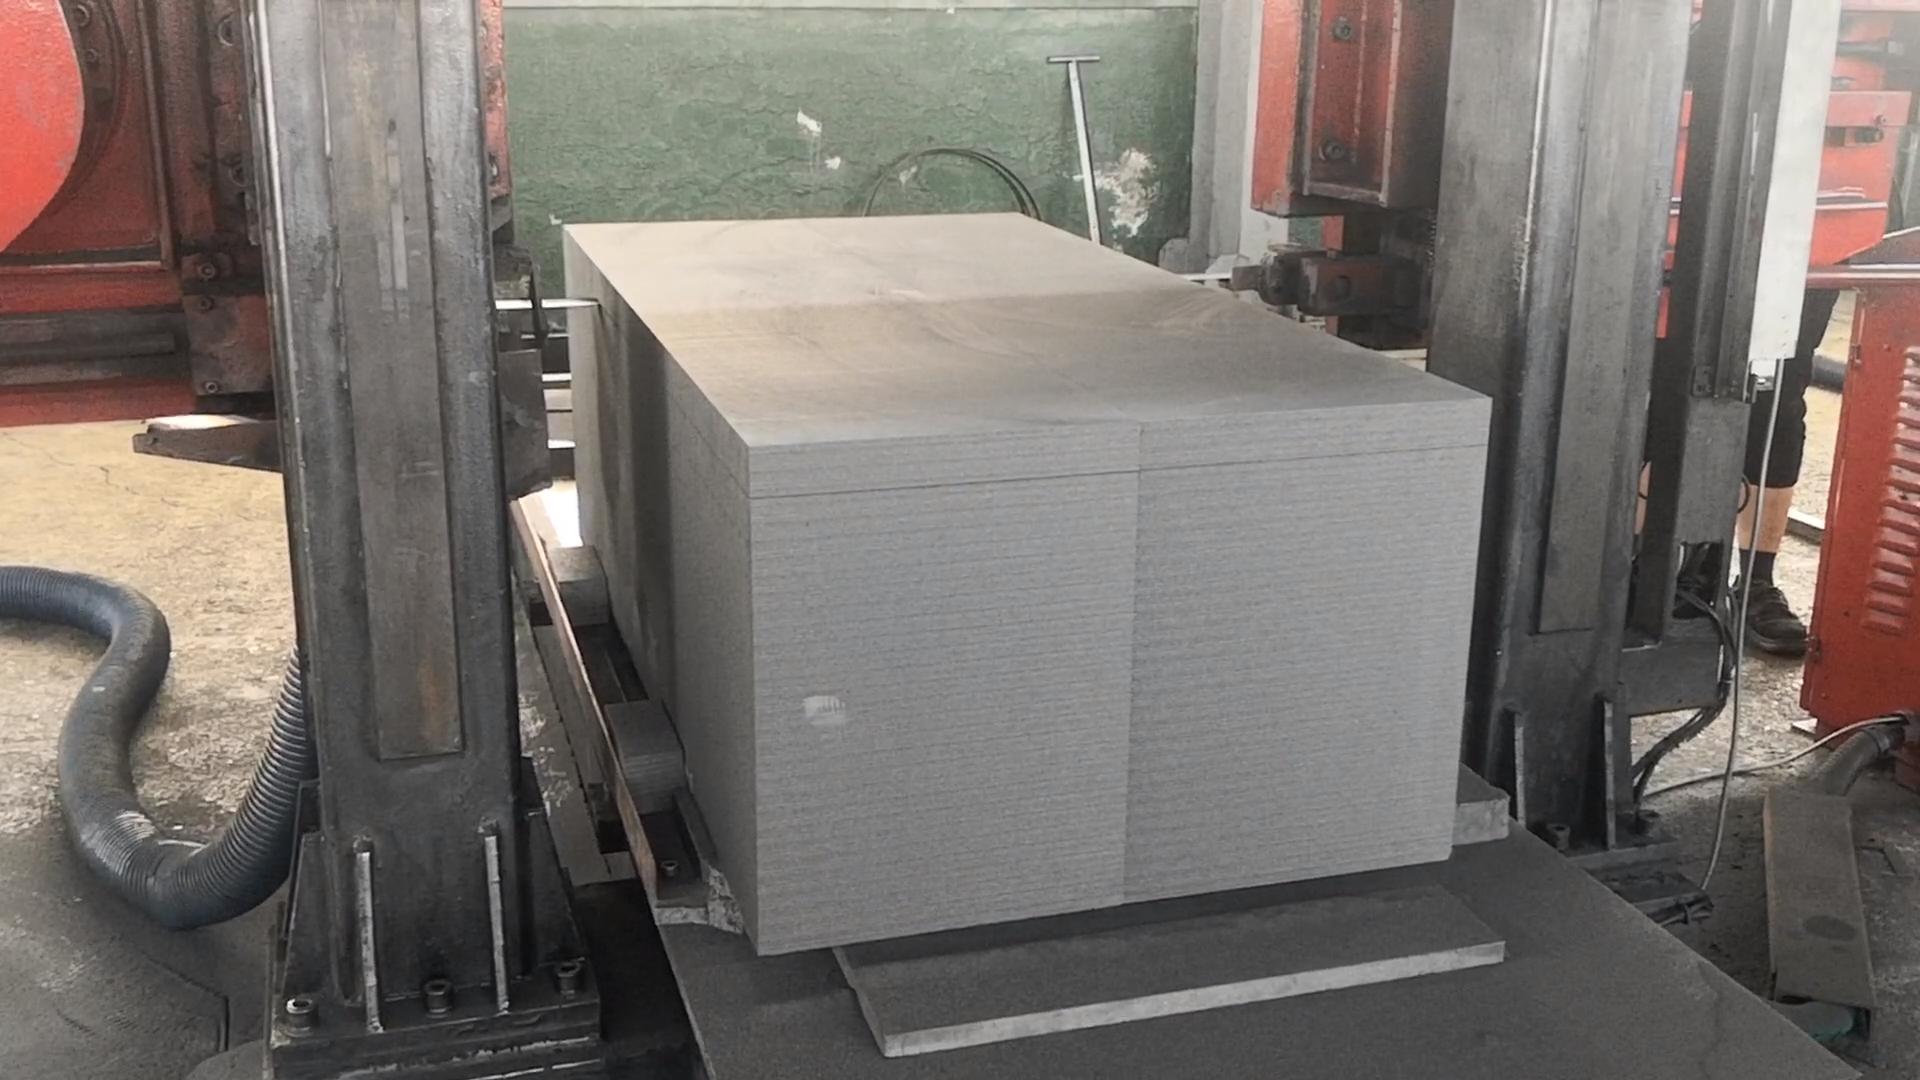 Geformte geformte Graphit kathoden blockieren in Aluminium-Elektrolyse zellen